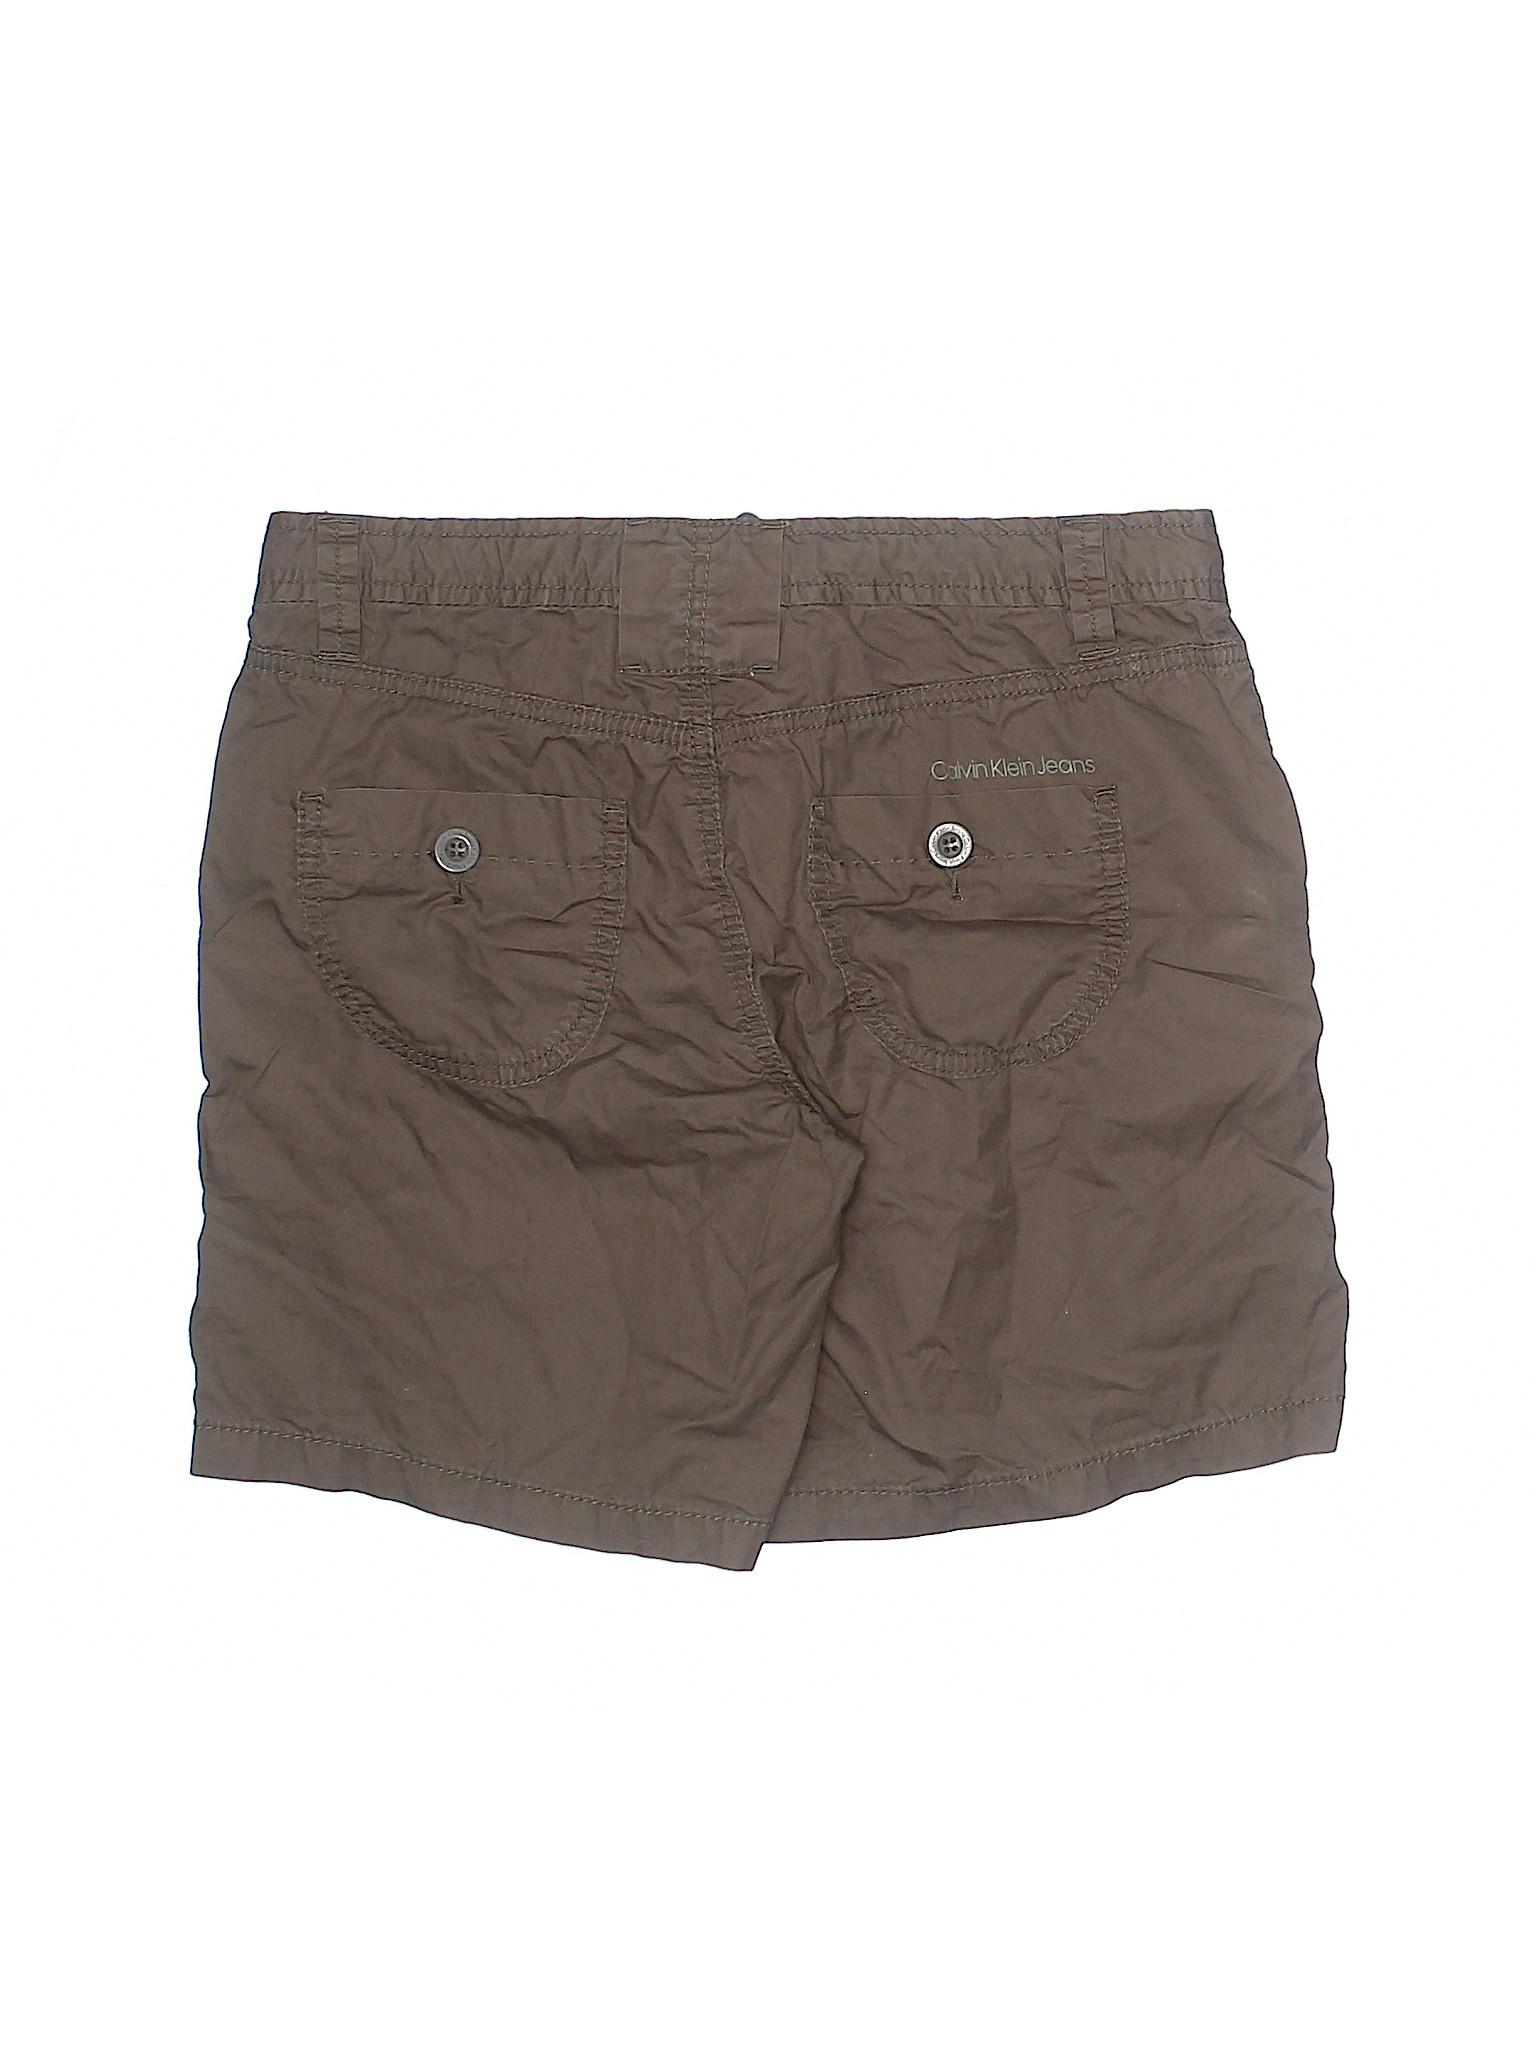 Khaki Boutique KLEIN CALVIN Shorts leisure JEANS FrBIw1rq